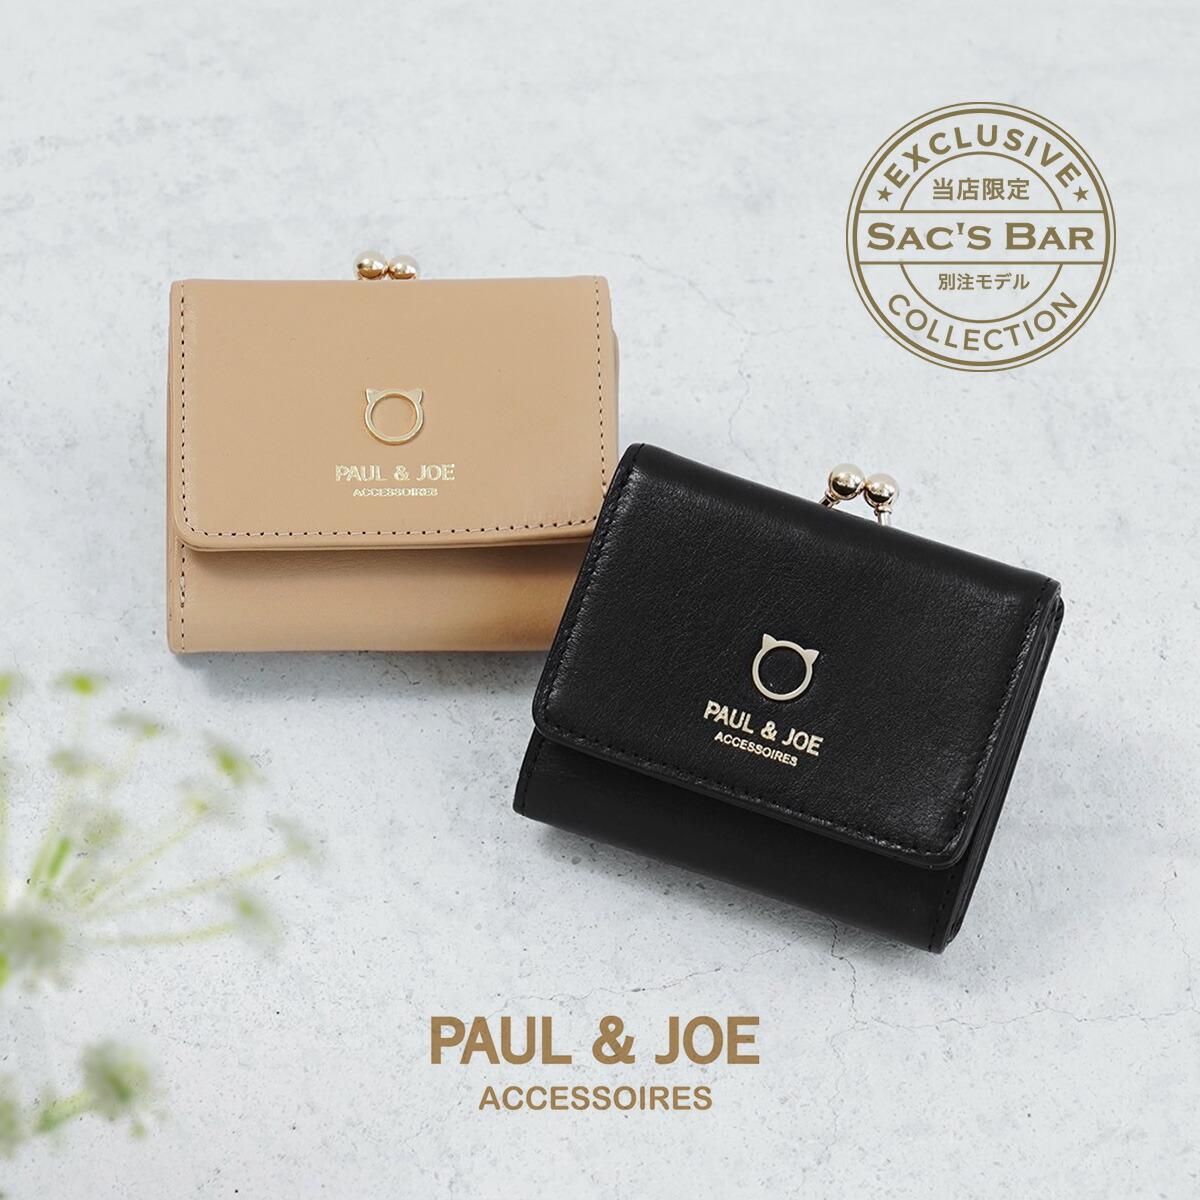 PAUL&JOE ACCESOIRES